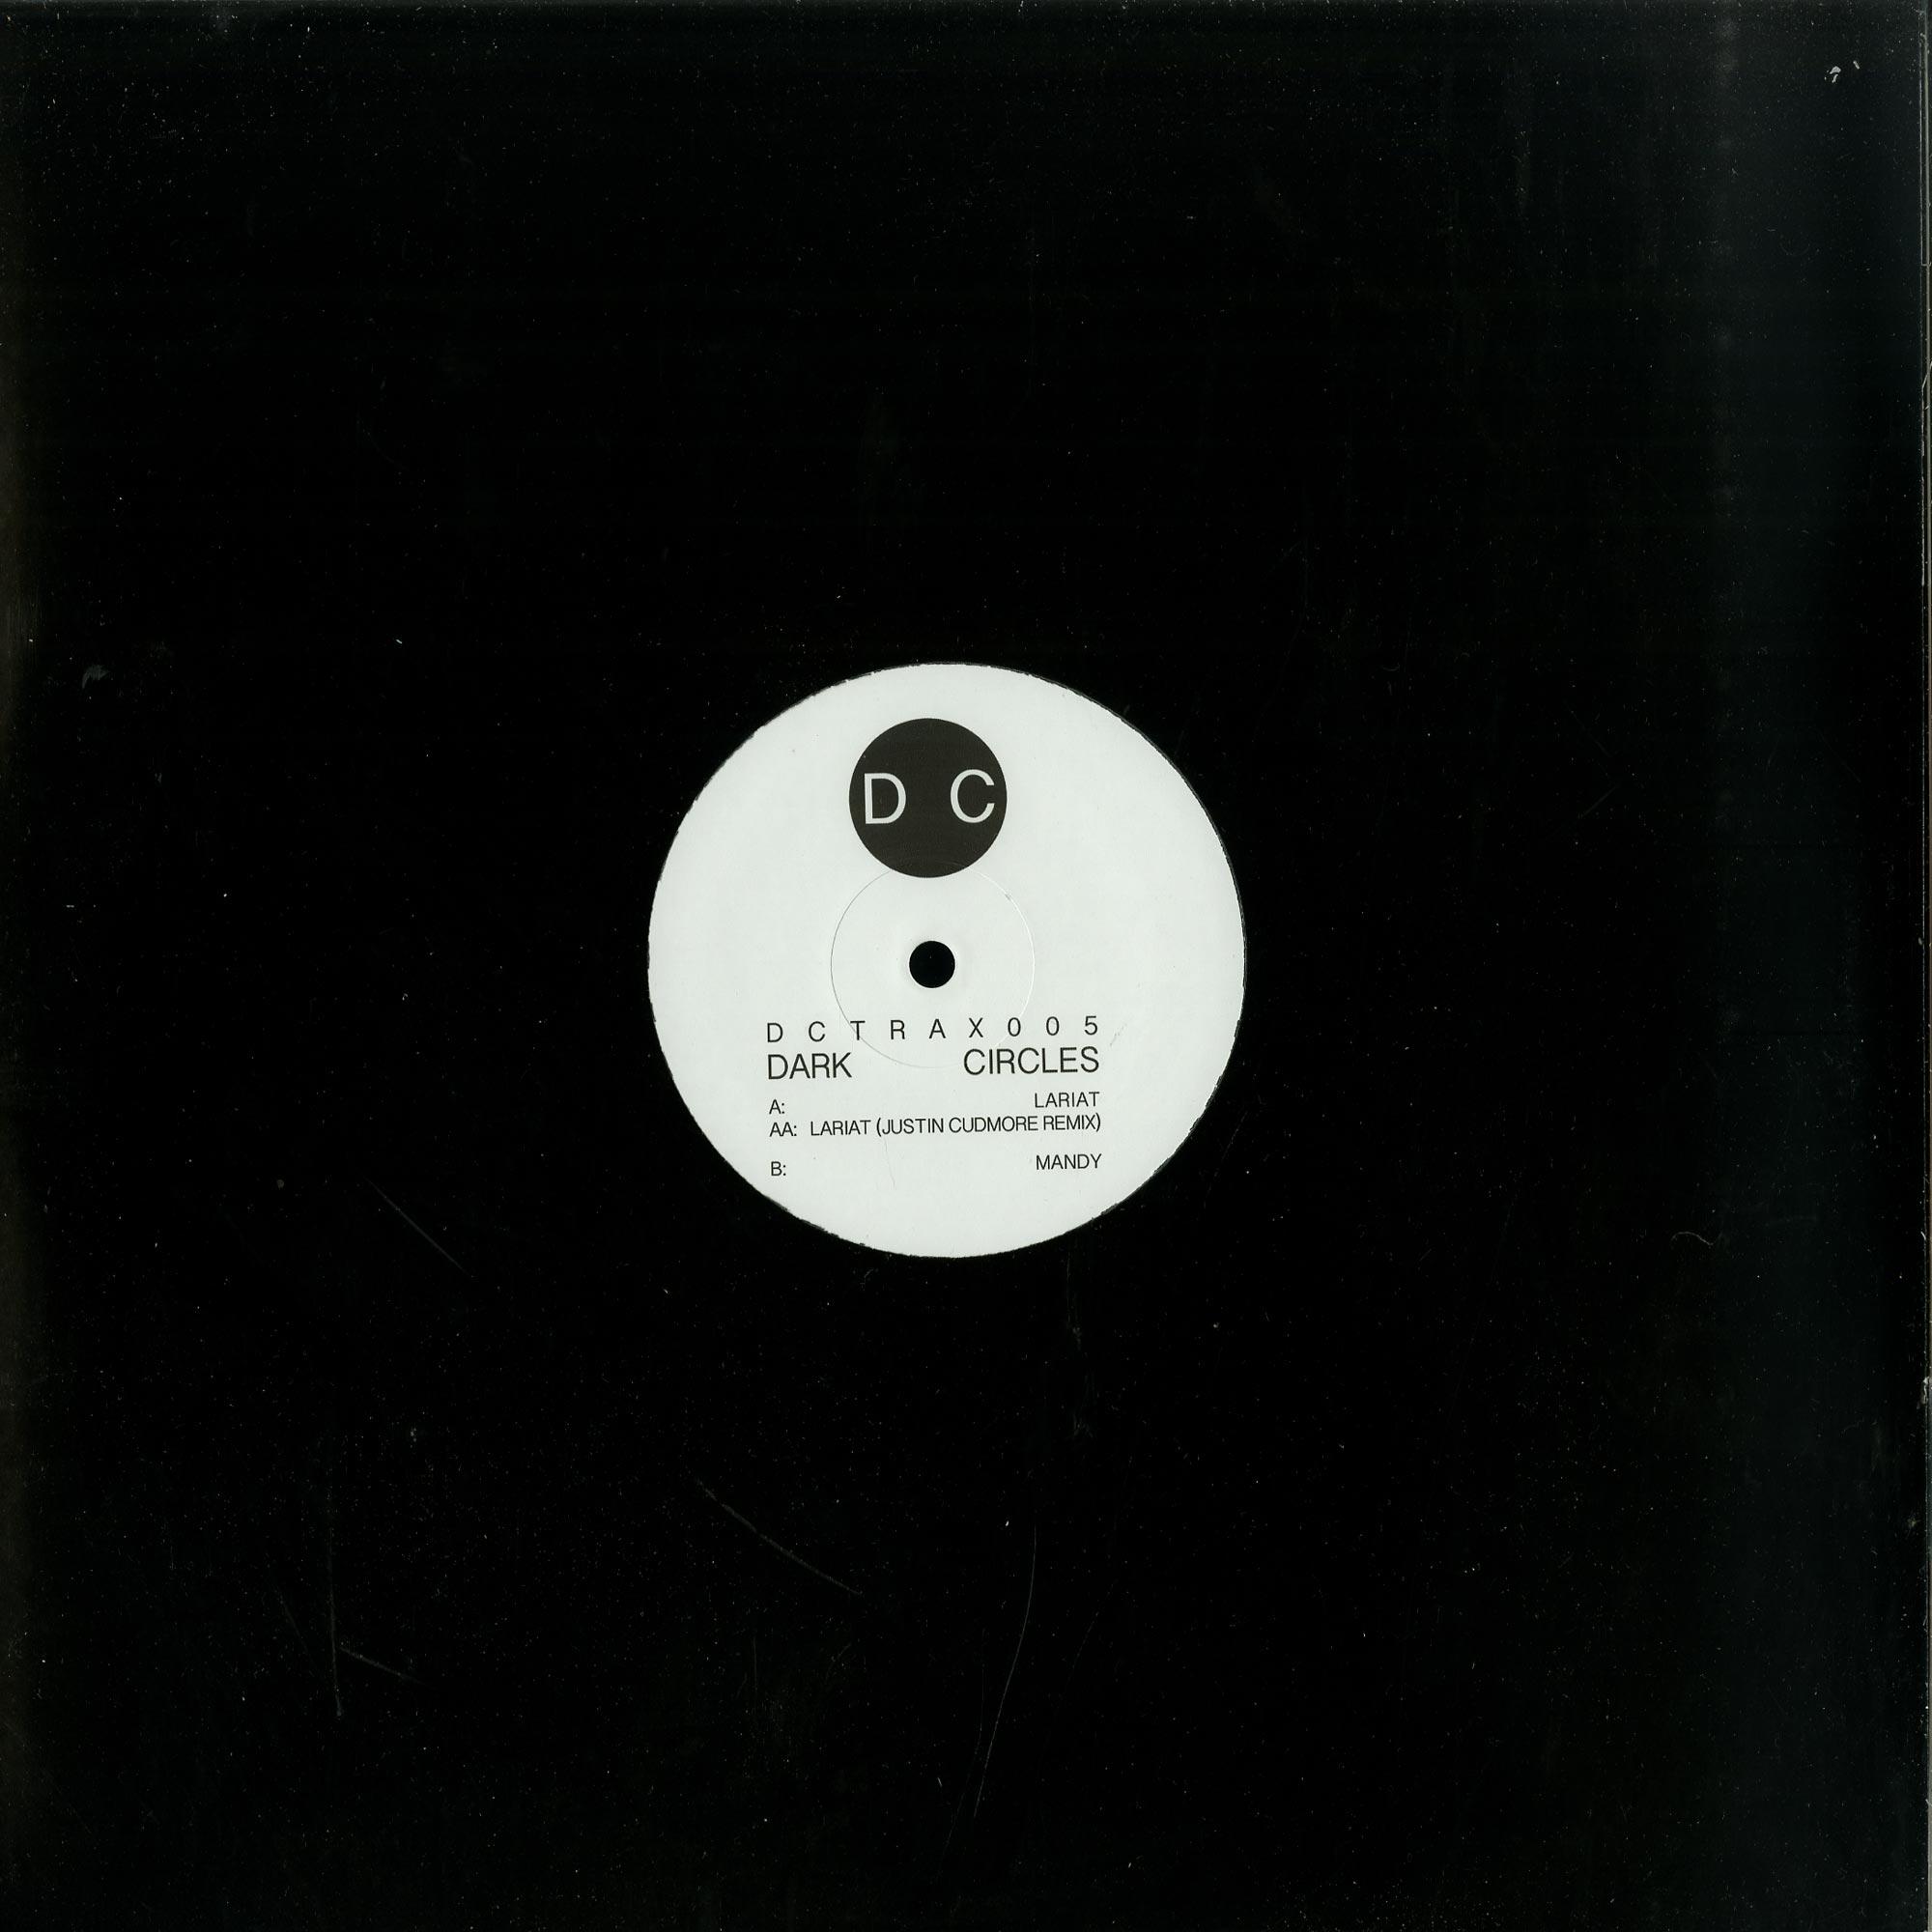 Dark Circles - DC TRAX 005